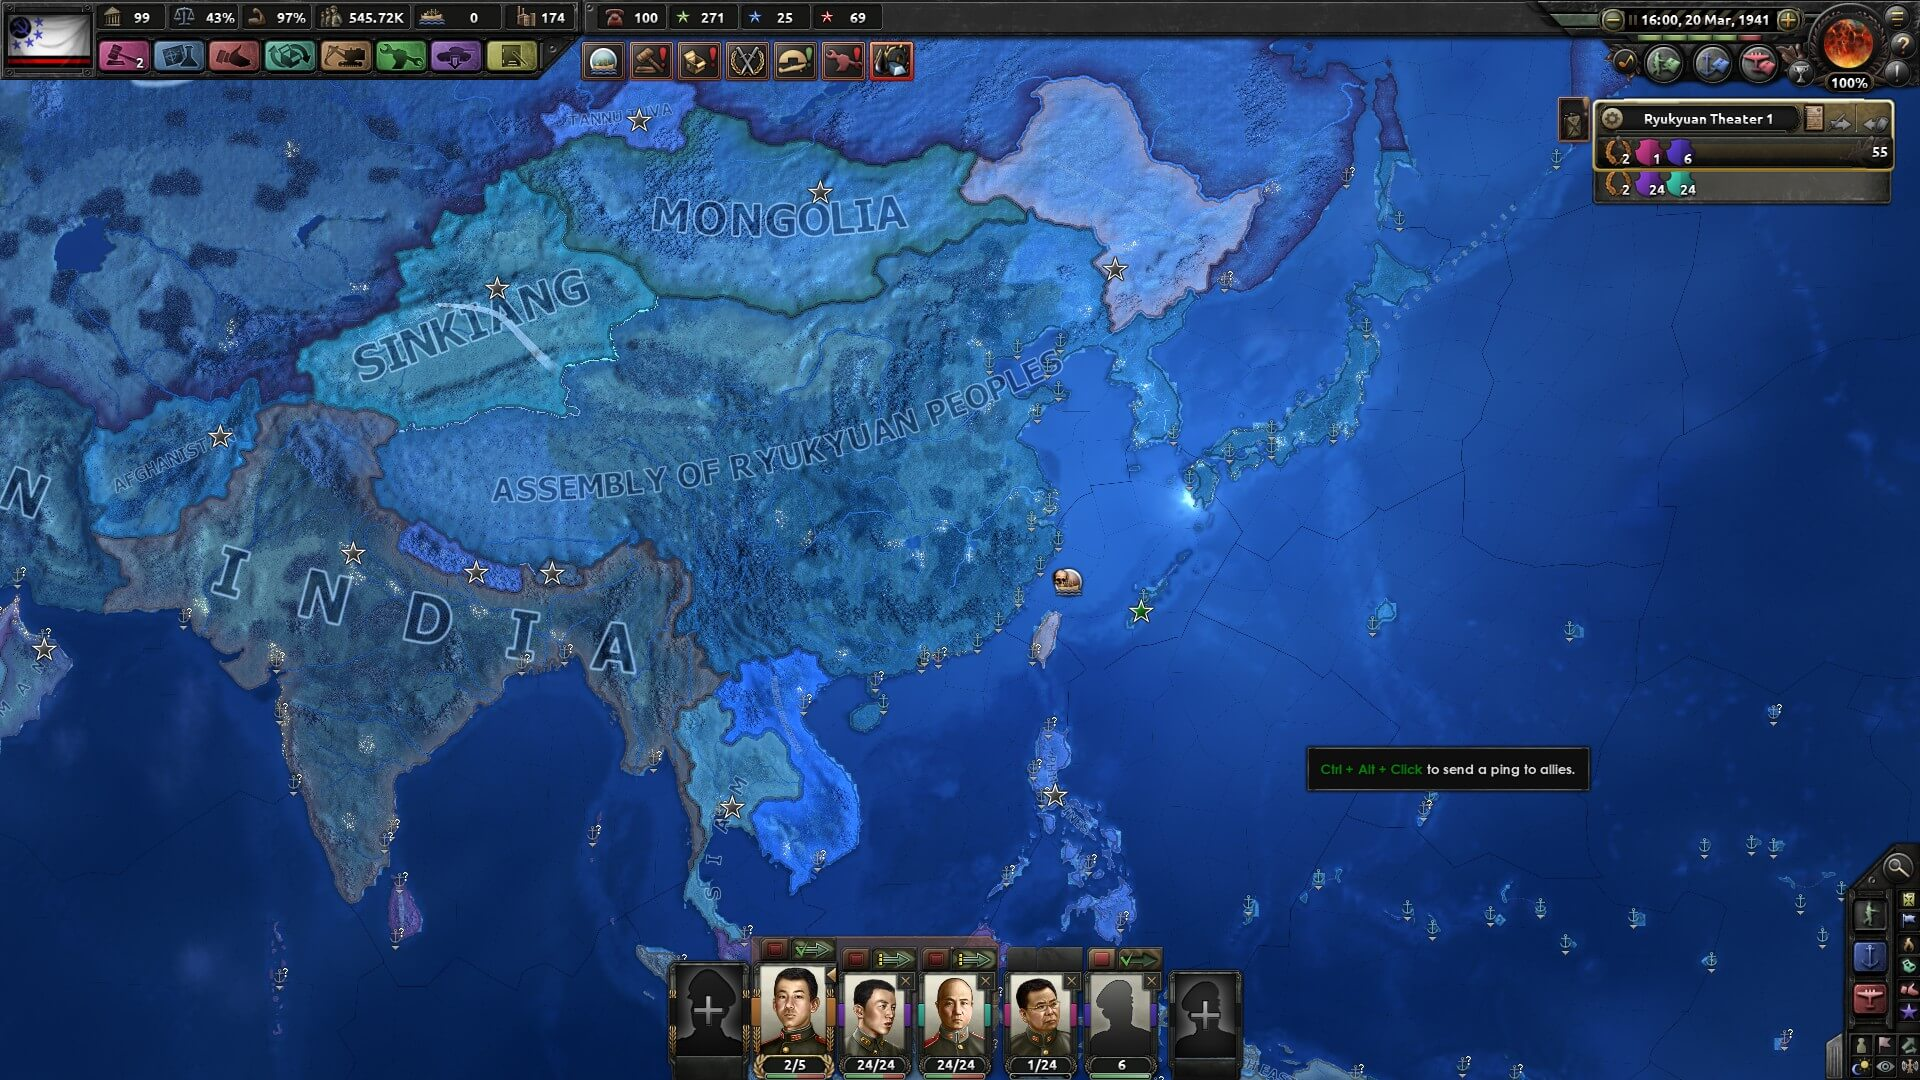 Hearts of Iron IV - The Three Mountains